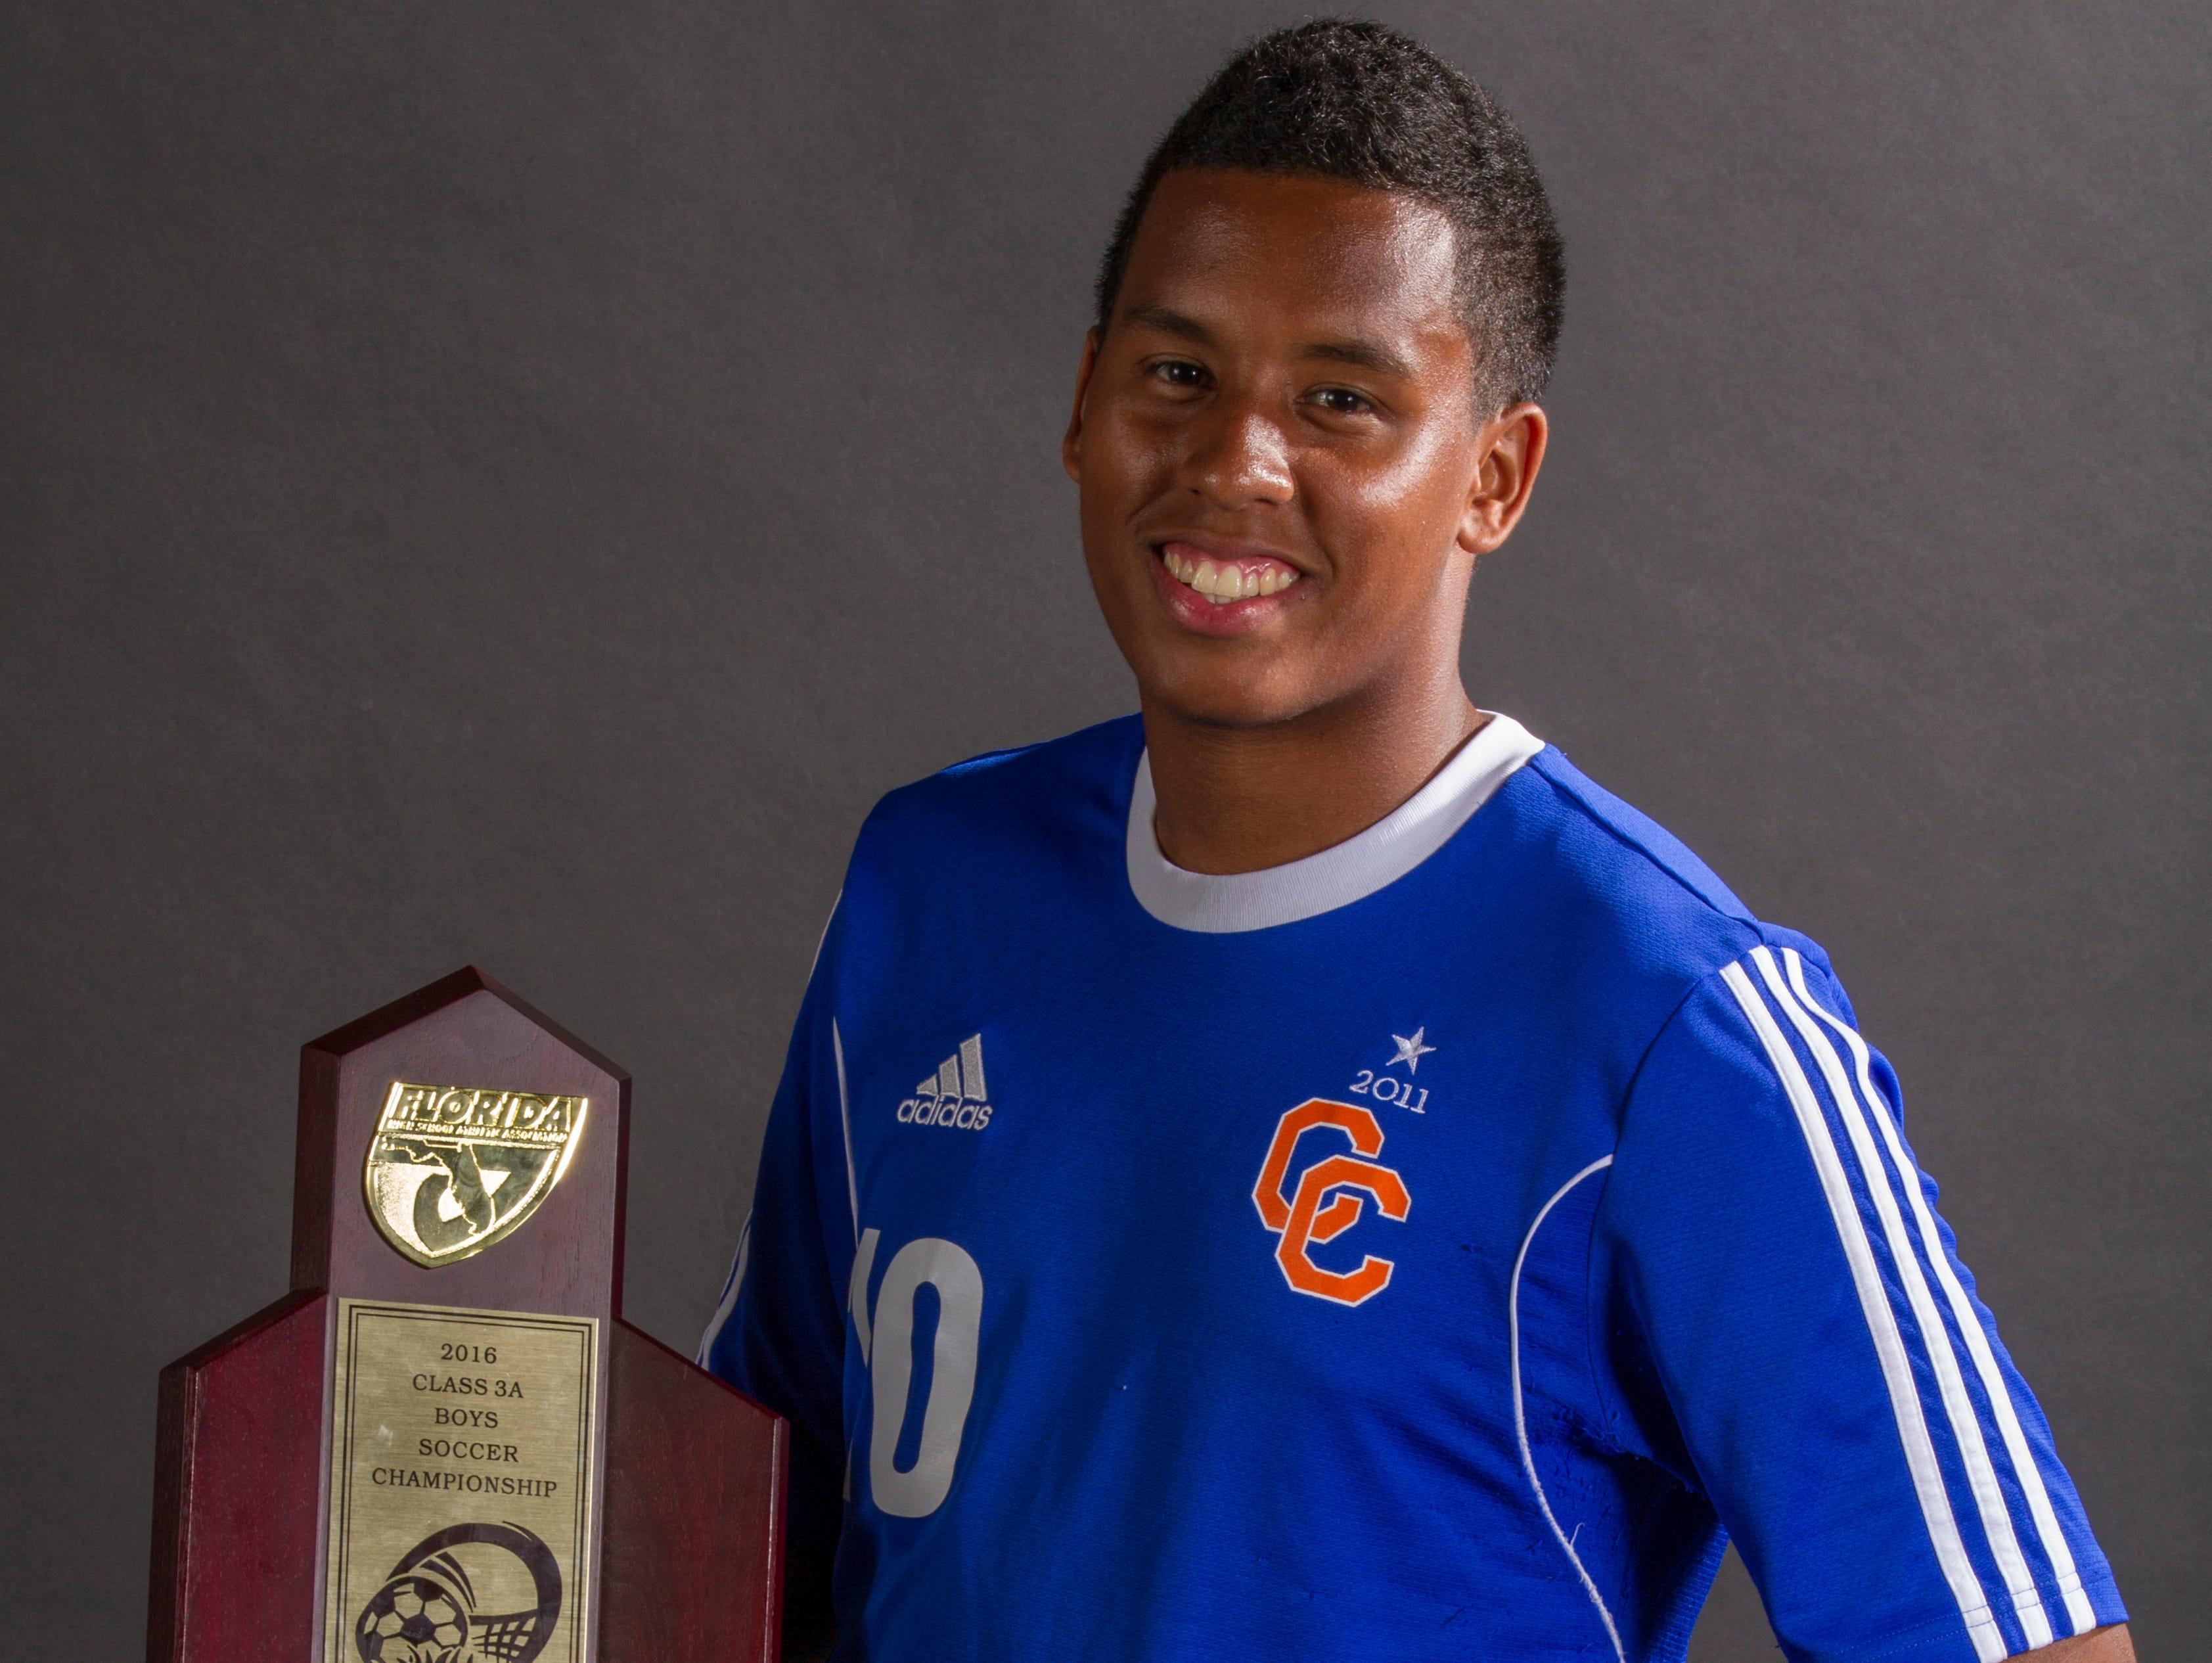 Camilo Avendano, 18, is a soccer player at Cape Coral High School.